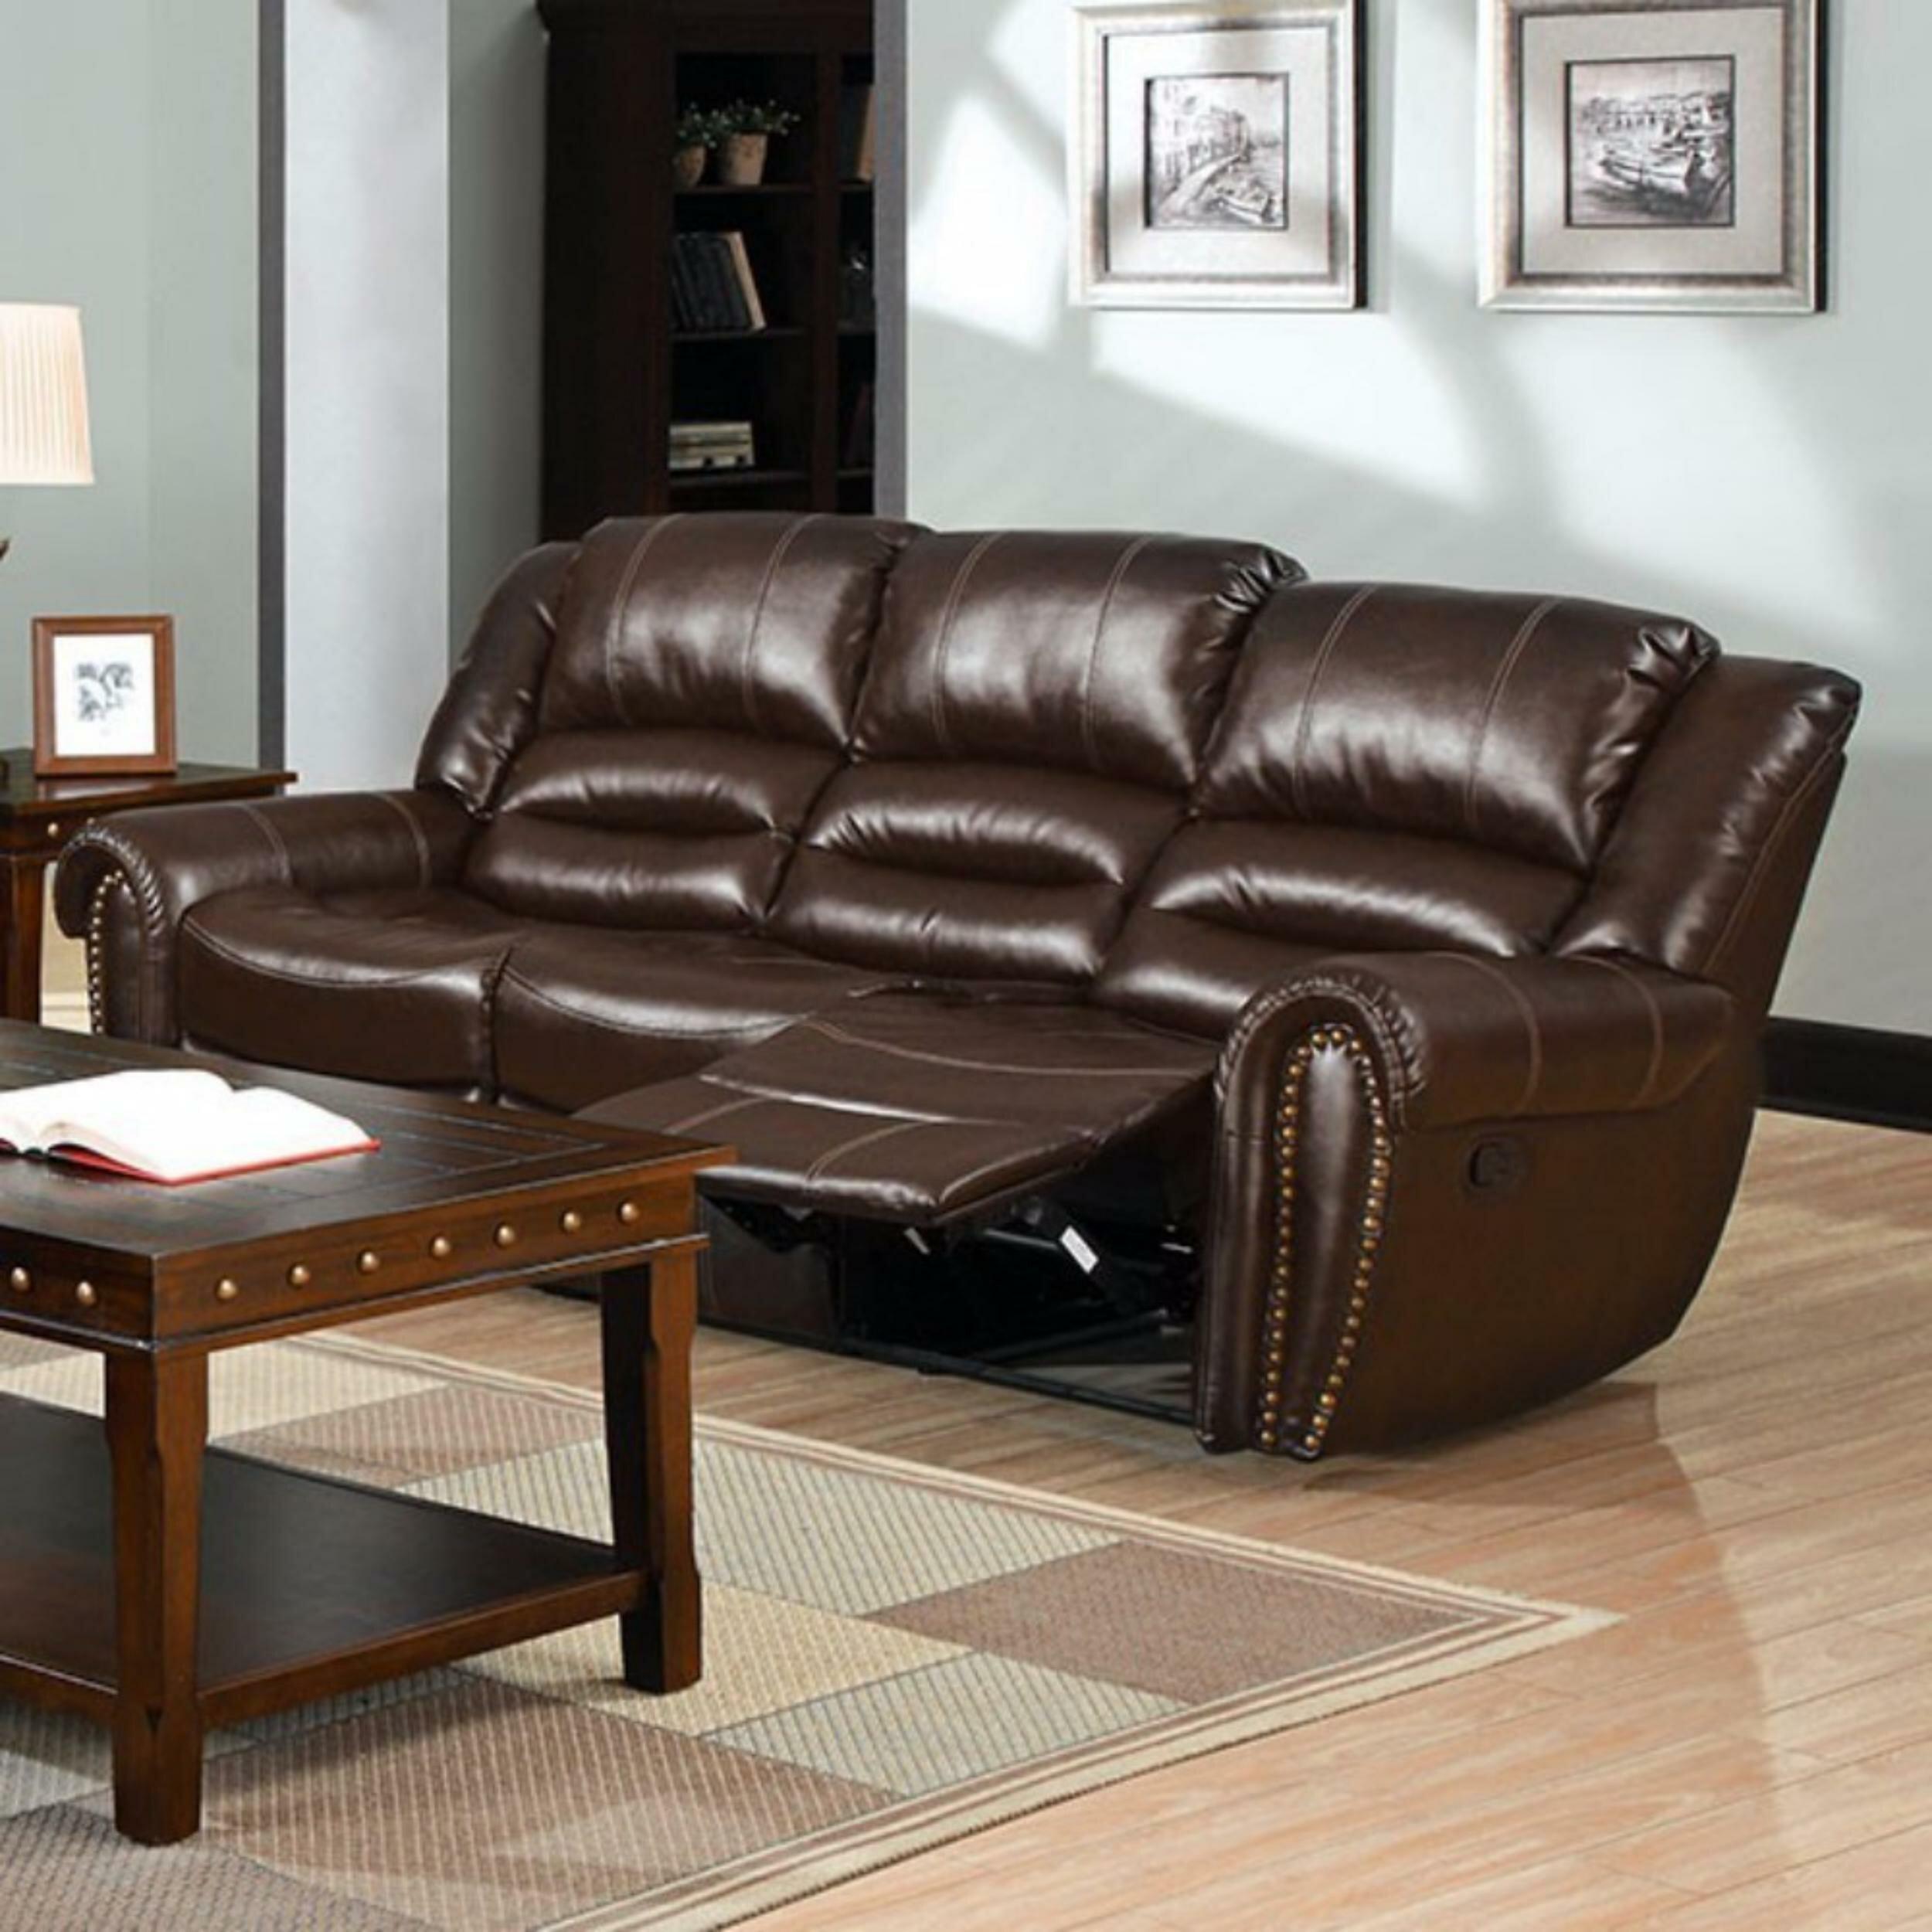 Gangemi Bonded Leather Recliner Sofa